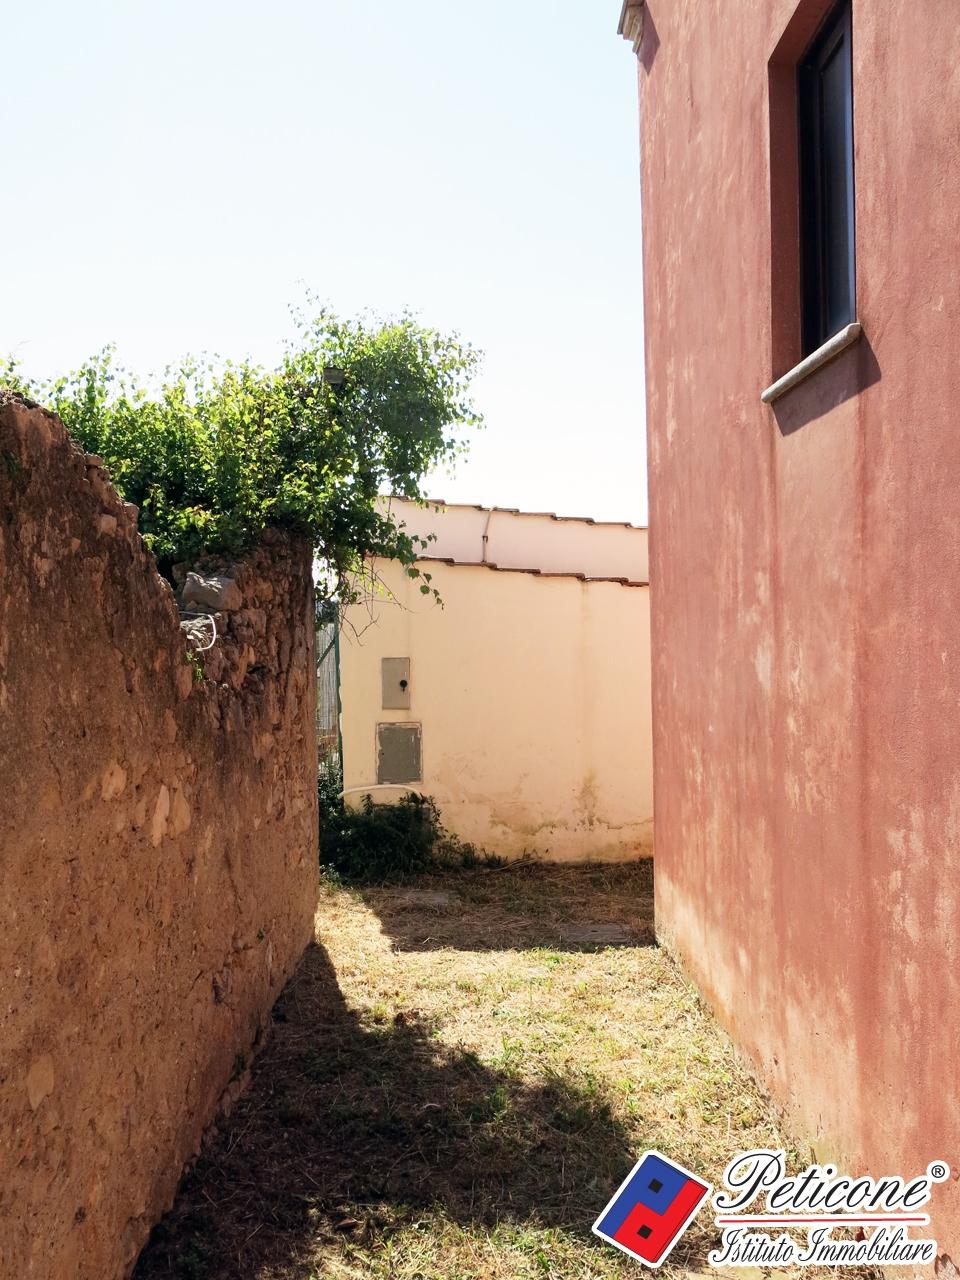 Villa in Vendita a Gaeta: 5 locali, 250 mq - Foto 26